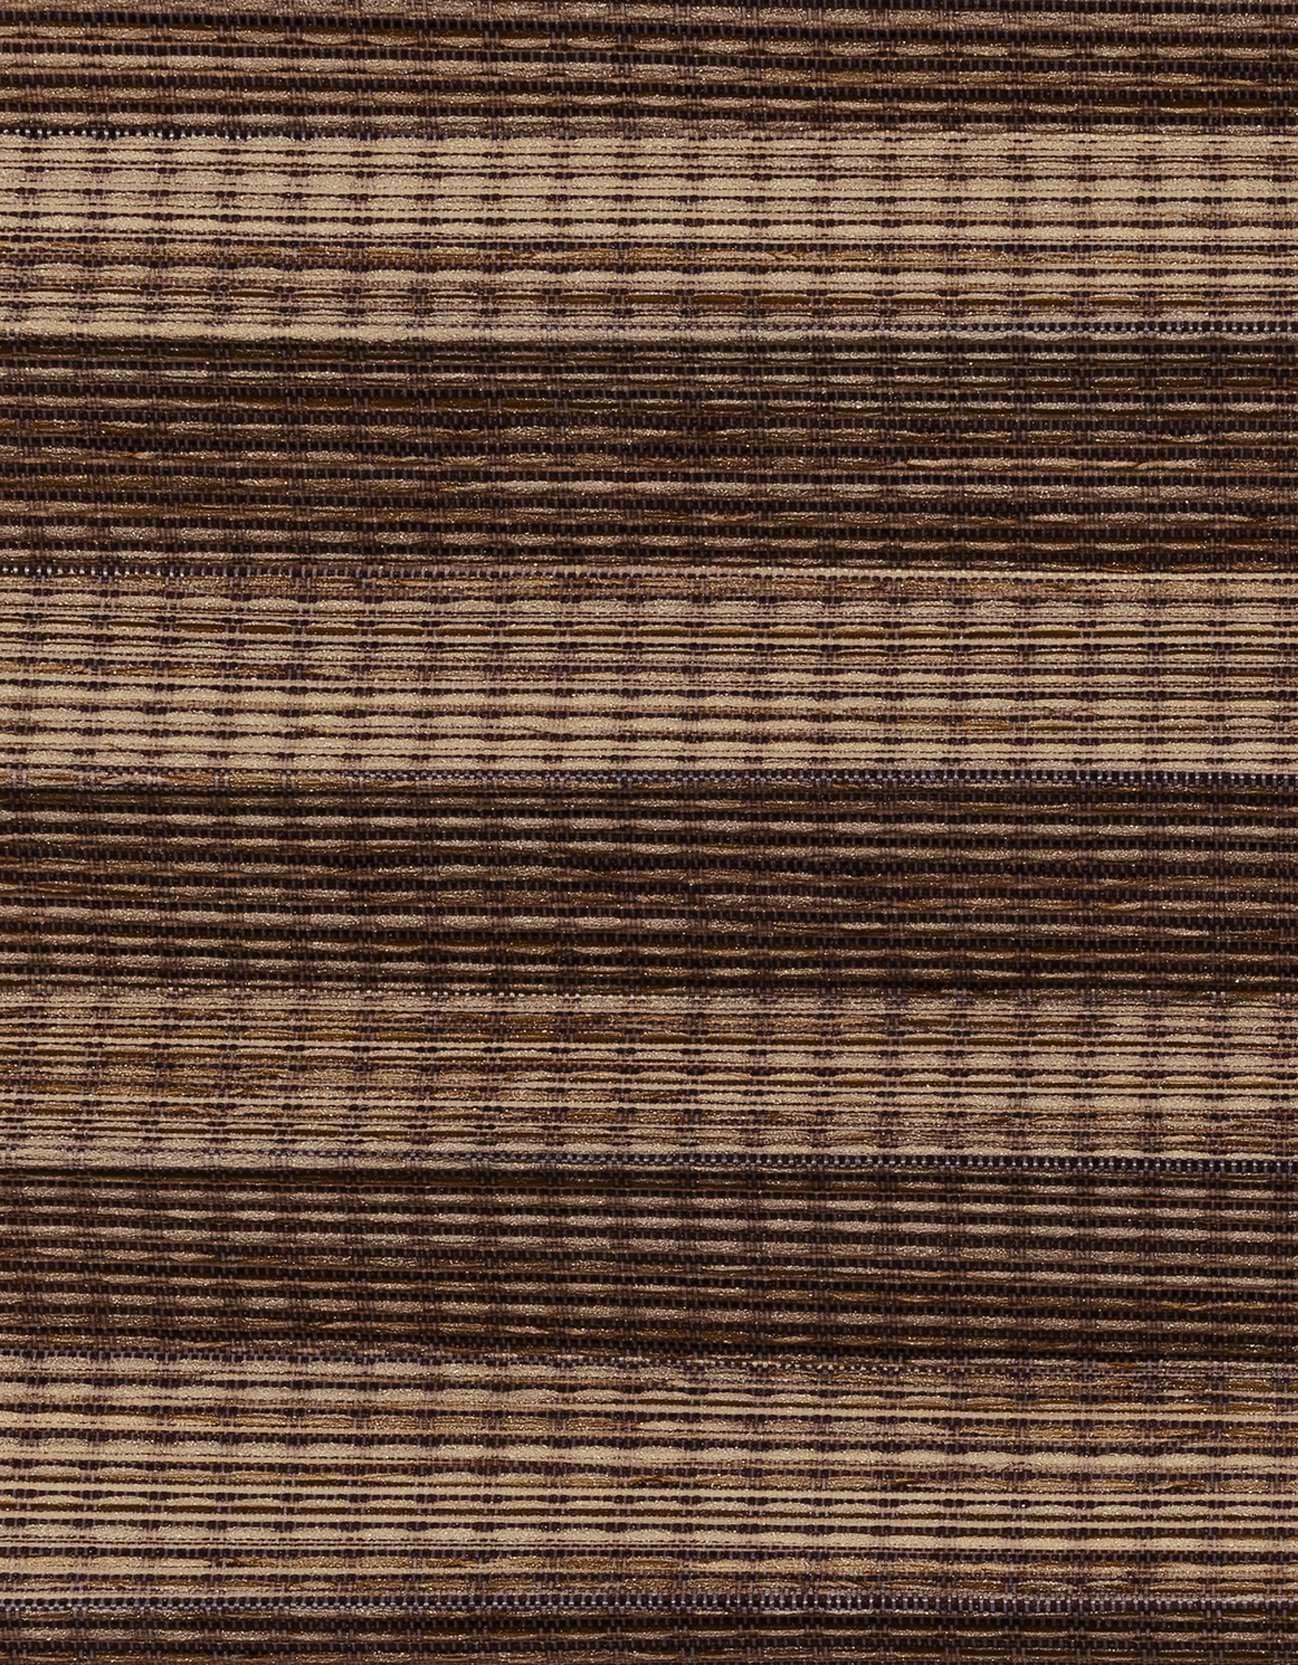 Semi-transparant Plisségordijn Kleurstaal Buffel